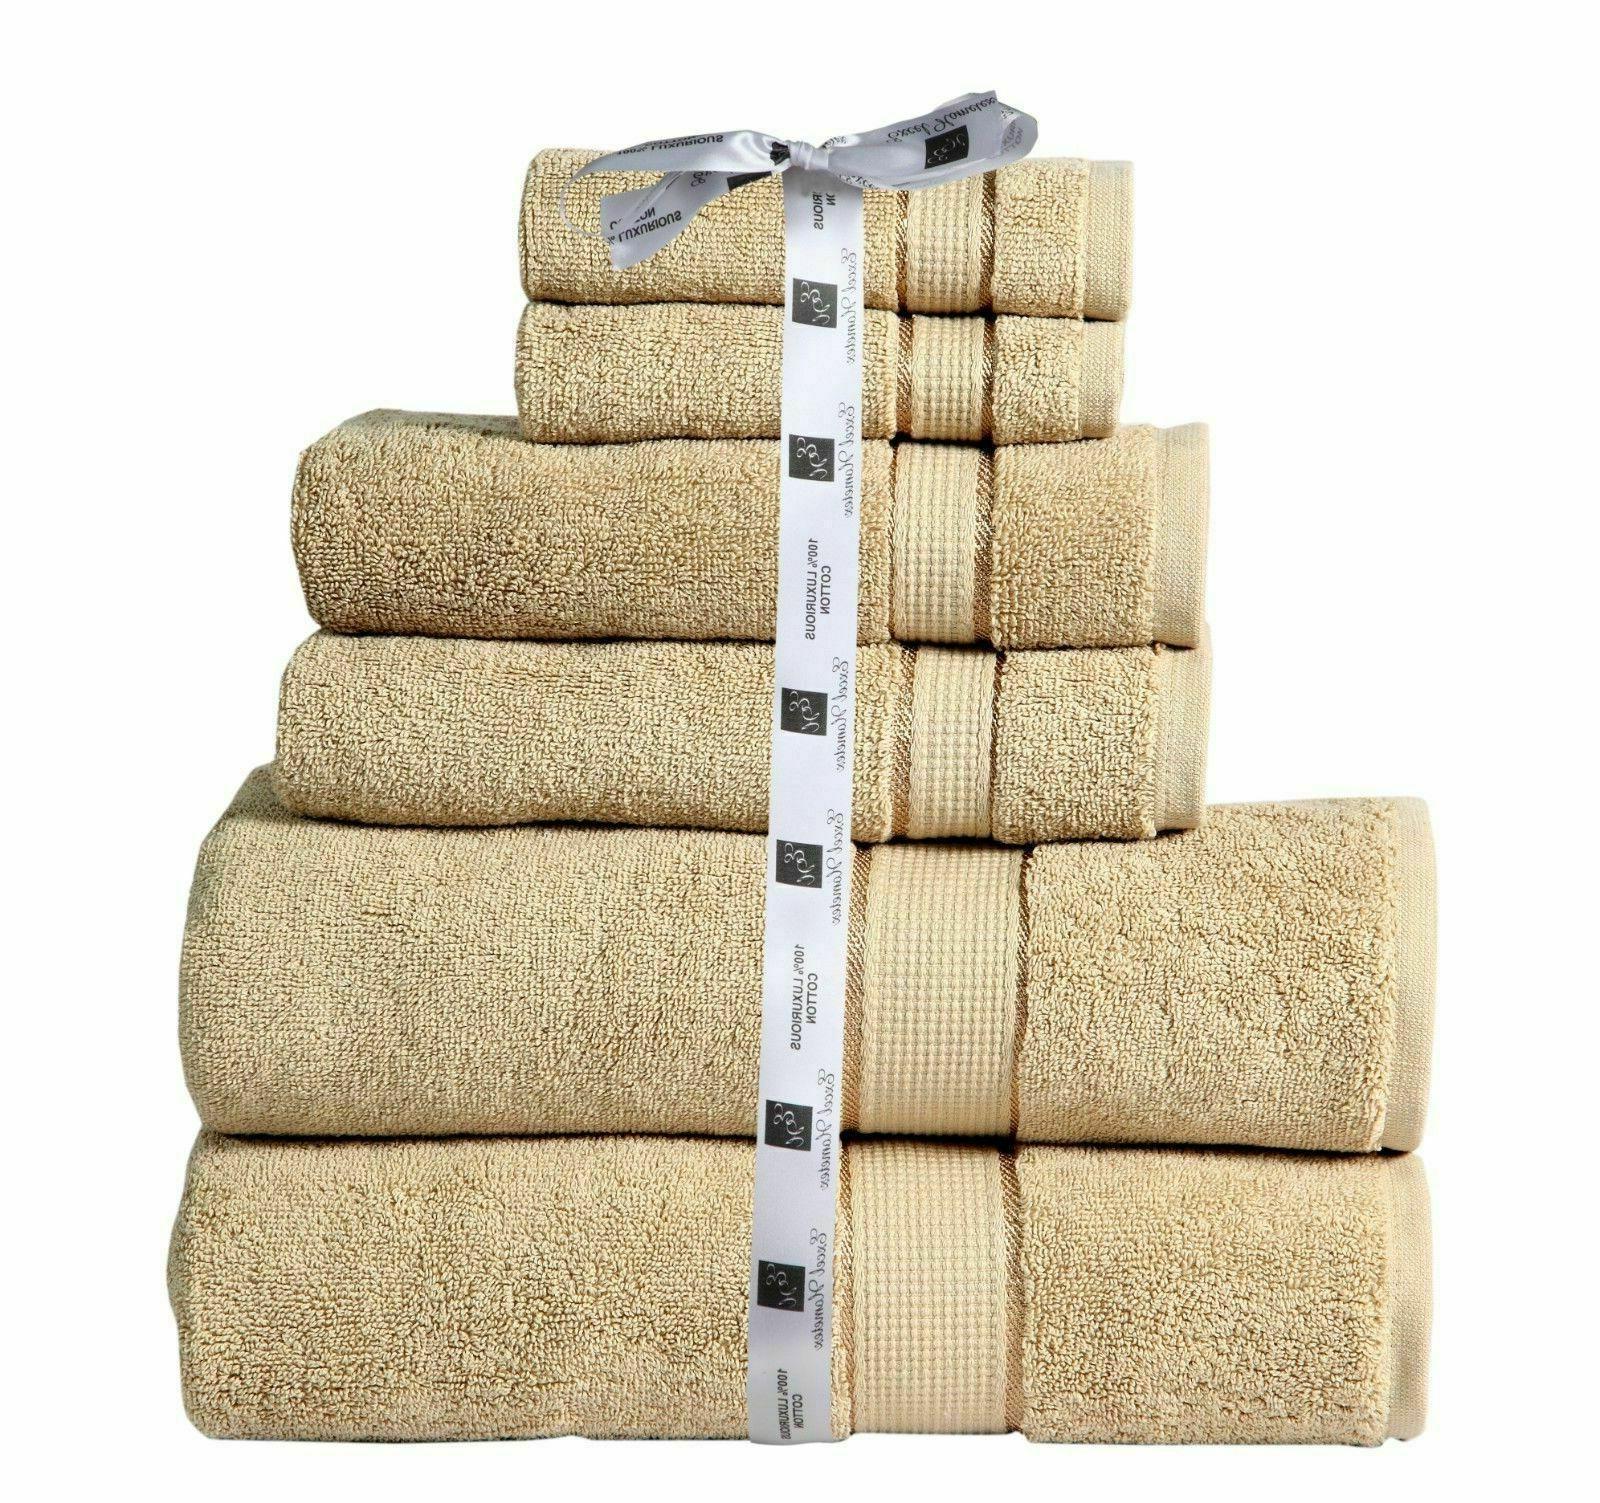 Towel Set Piece Set Cotton 600 GSM- 2 Bath Towel 2 Hand